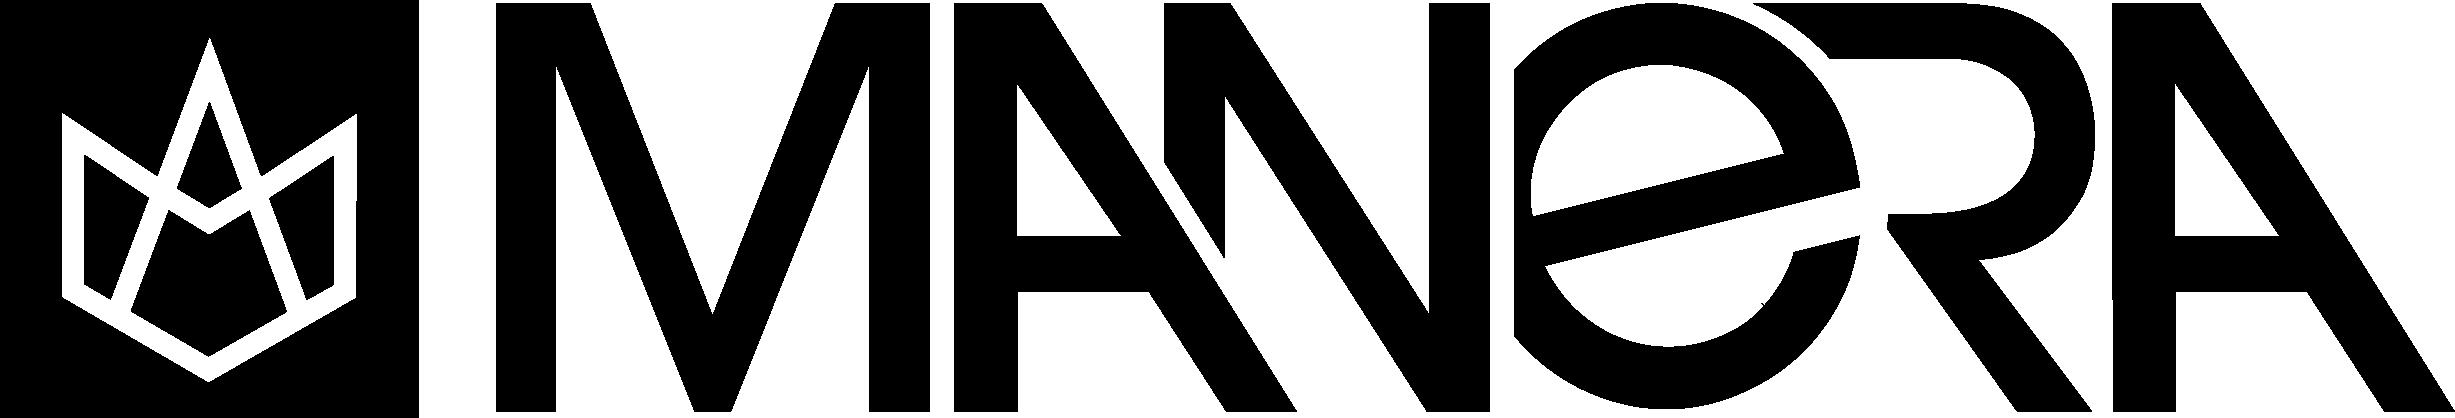 Manera